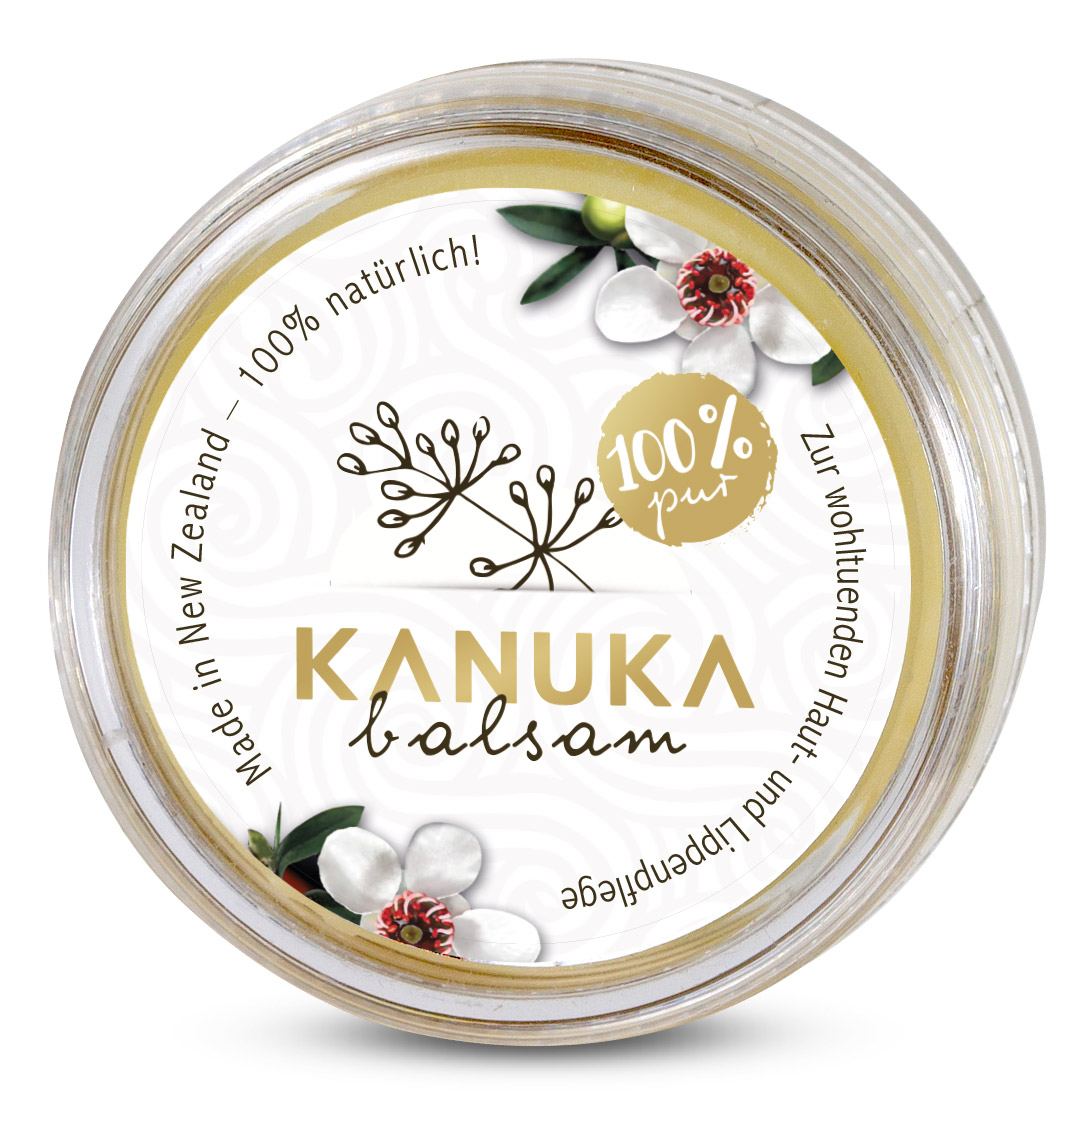 Balsam Kanuka pentru piele - 13 g imagine produs 2021 Haddrell's